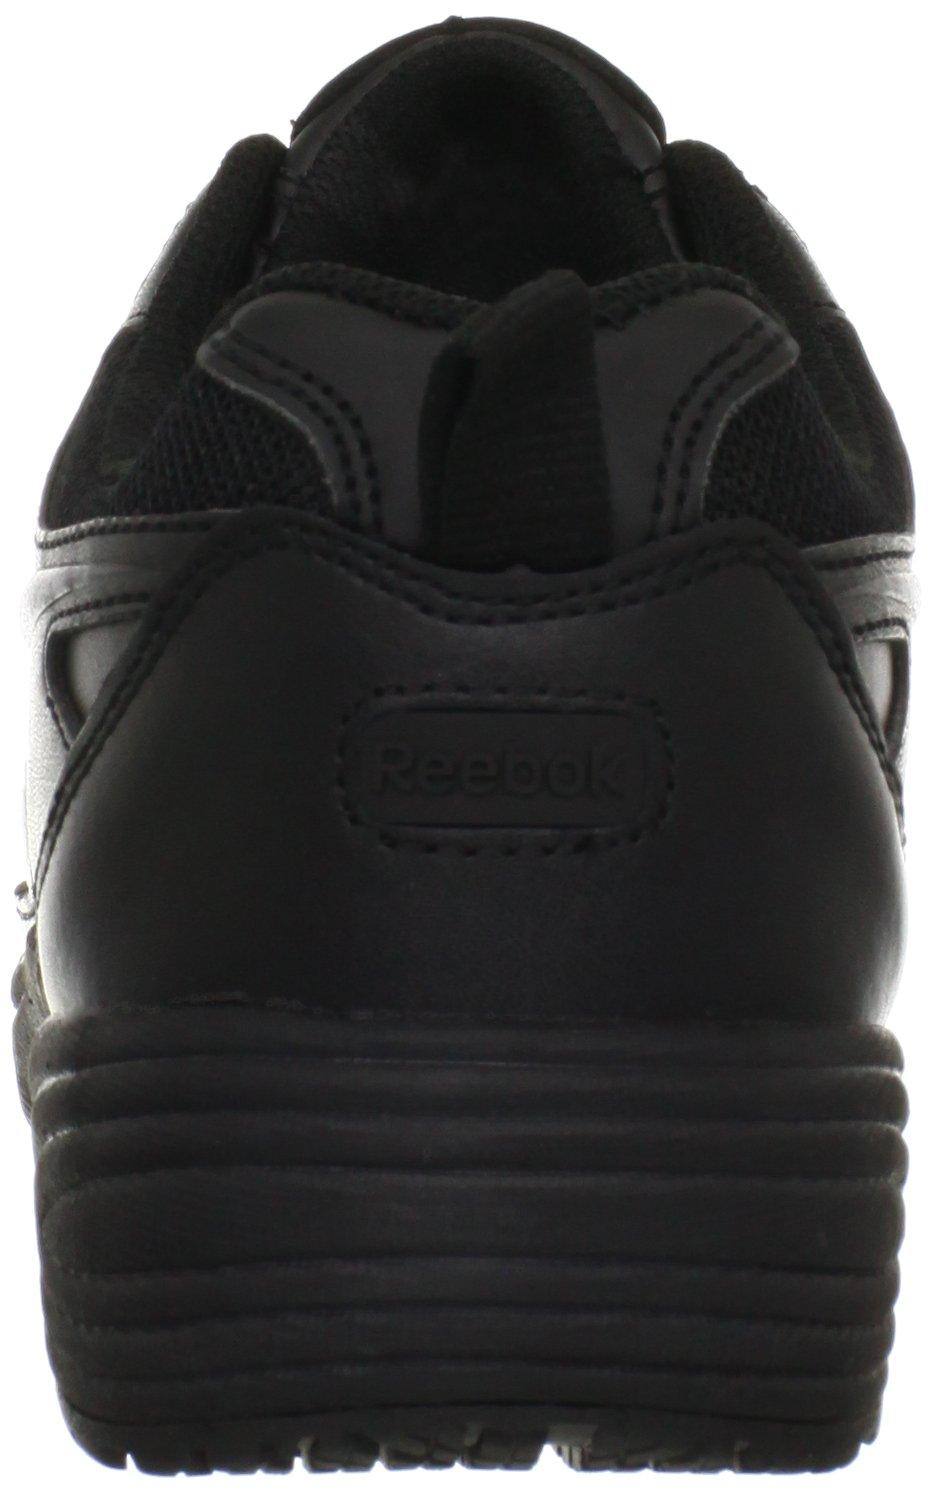 Reebok Work Women's Jorie RB186 Athletic Safety Shoe B00A7VT0GM 10 W US Black